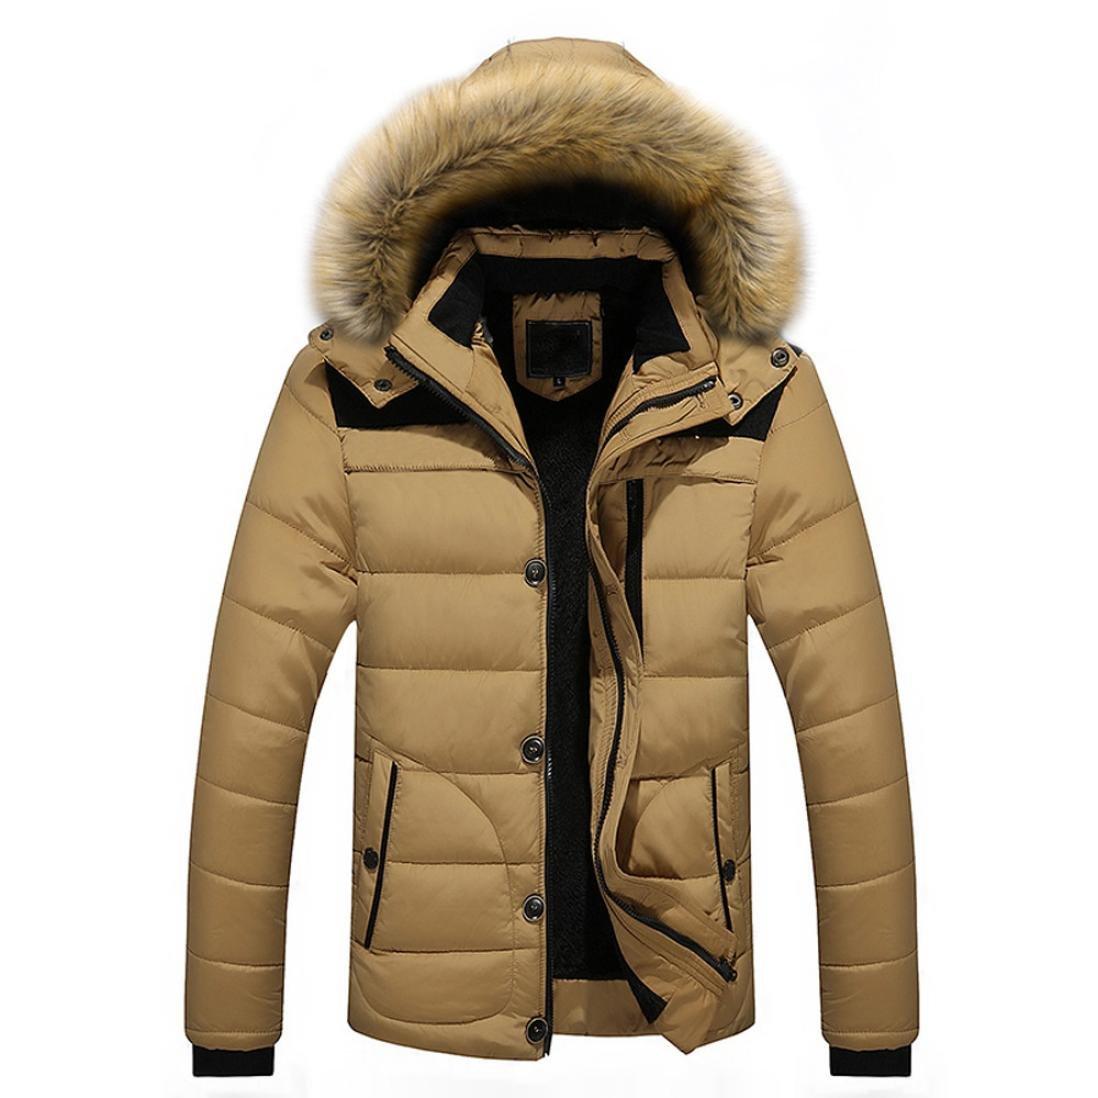 HOT ! YANG-YI Men Warm Blouse Winter Thick Jacket Plus Fur Hooded Coat Jacket (XL, Khaki)